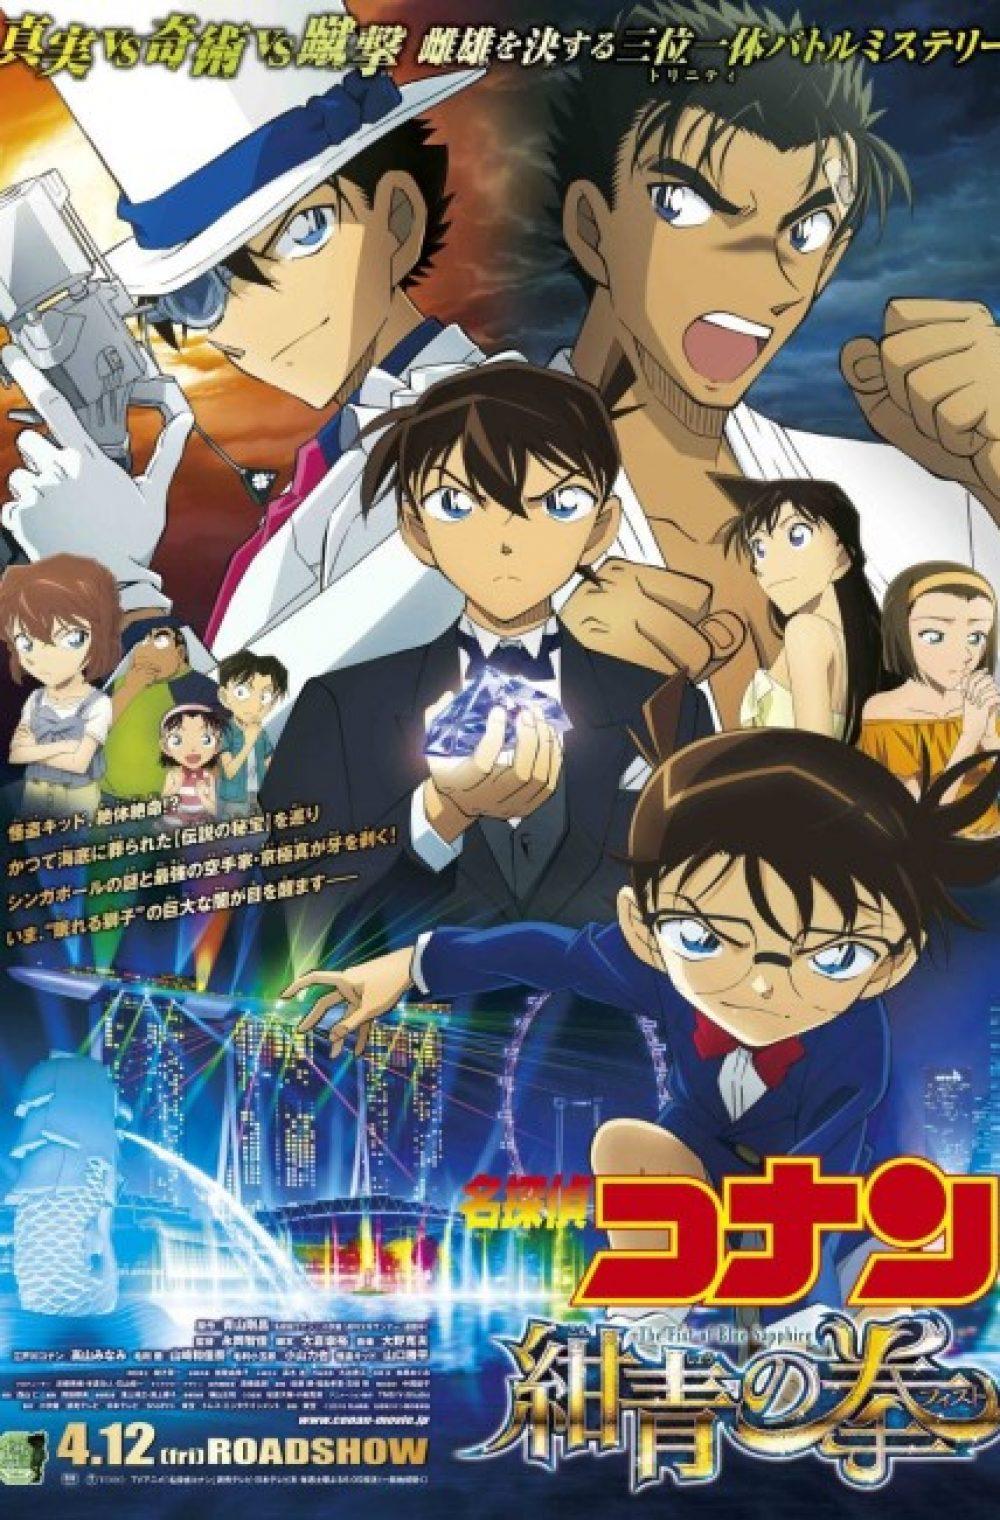 Meitantei Conan Movie 23: Konjou no Fist ( Detective Conan Movie 23: The Fist of Blue Sapphire )